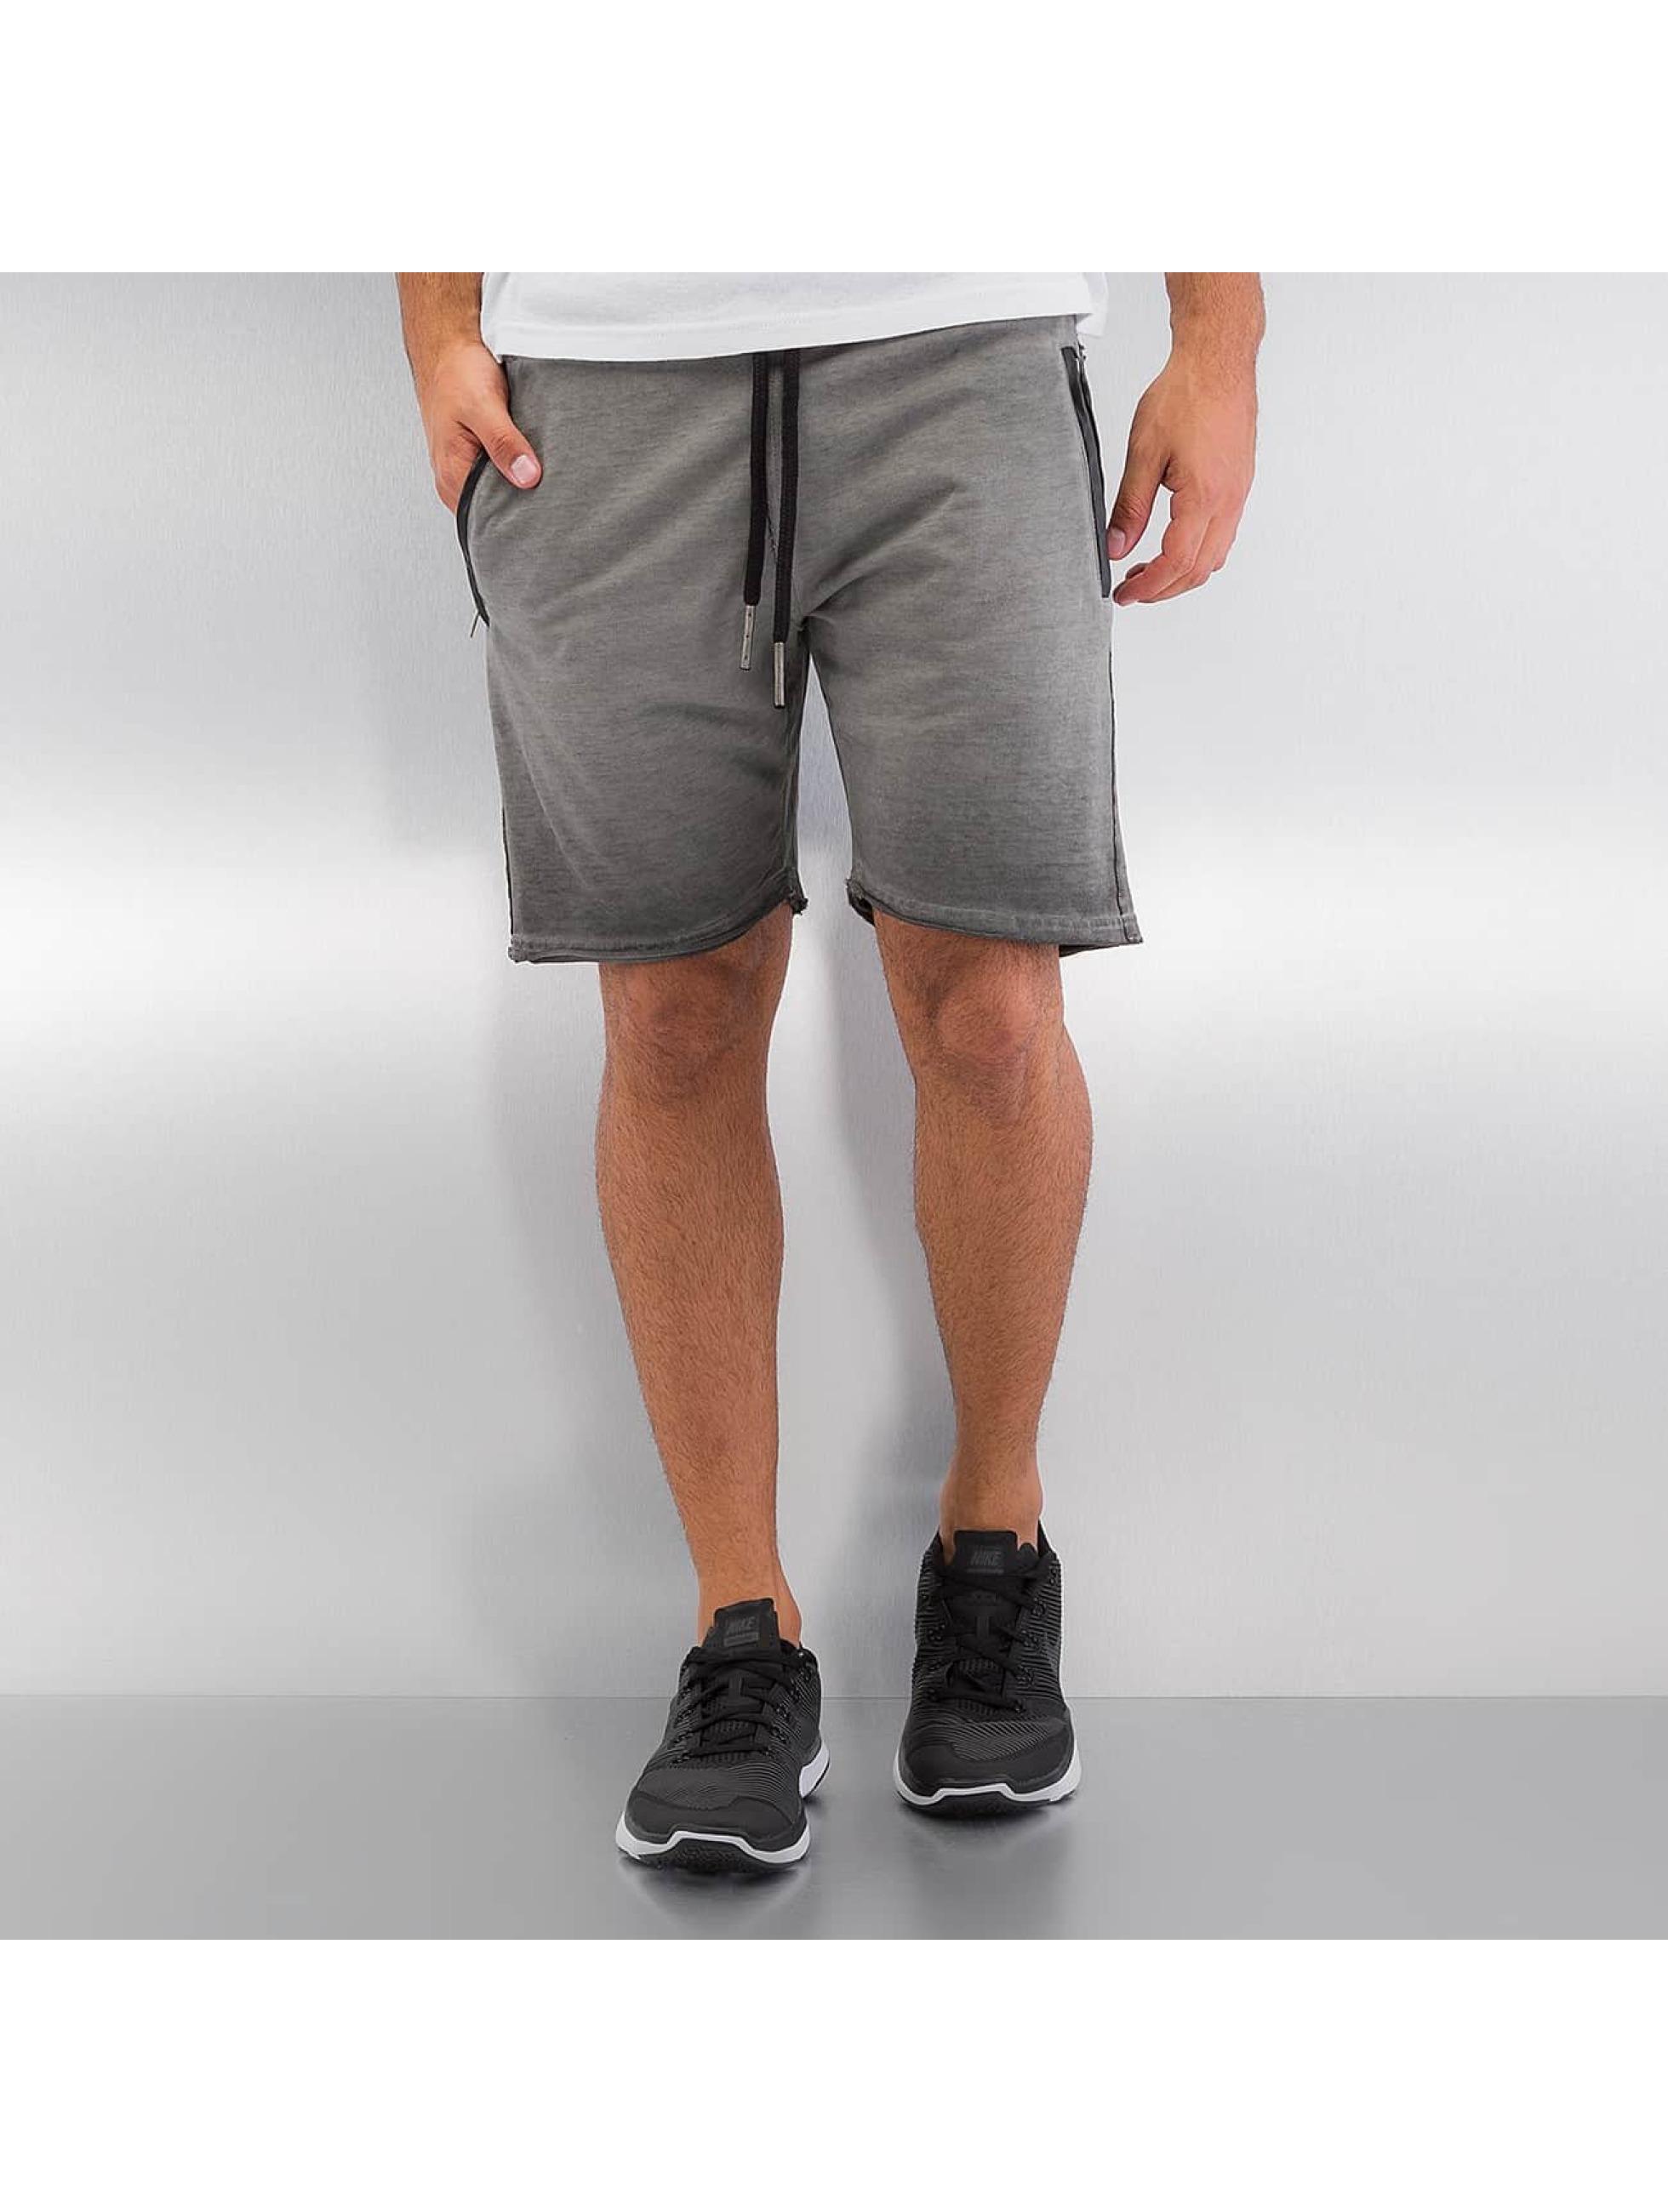 Yezz Männer Shorts Terry Oil in grau